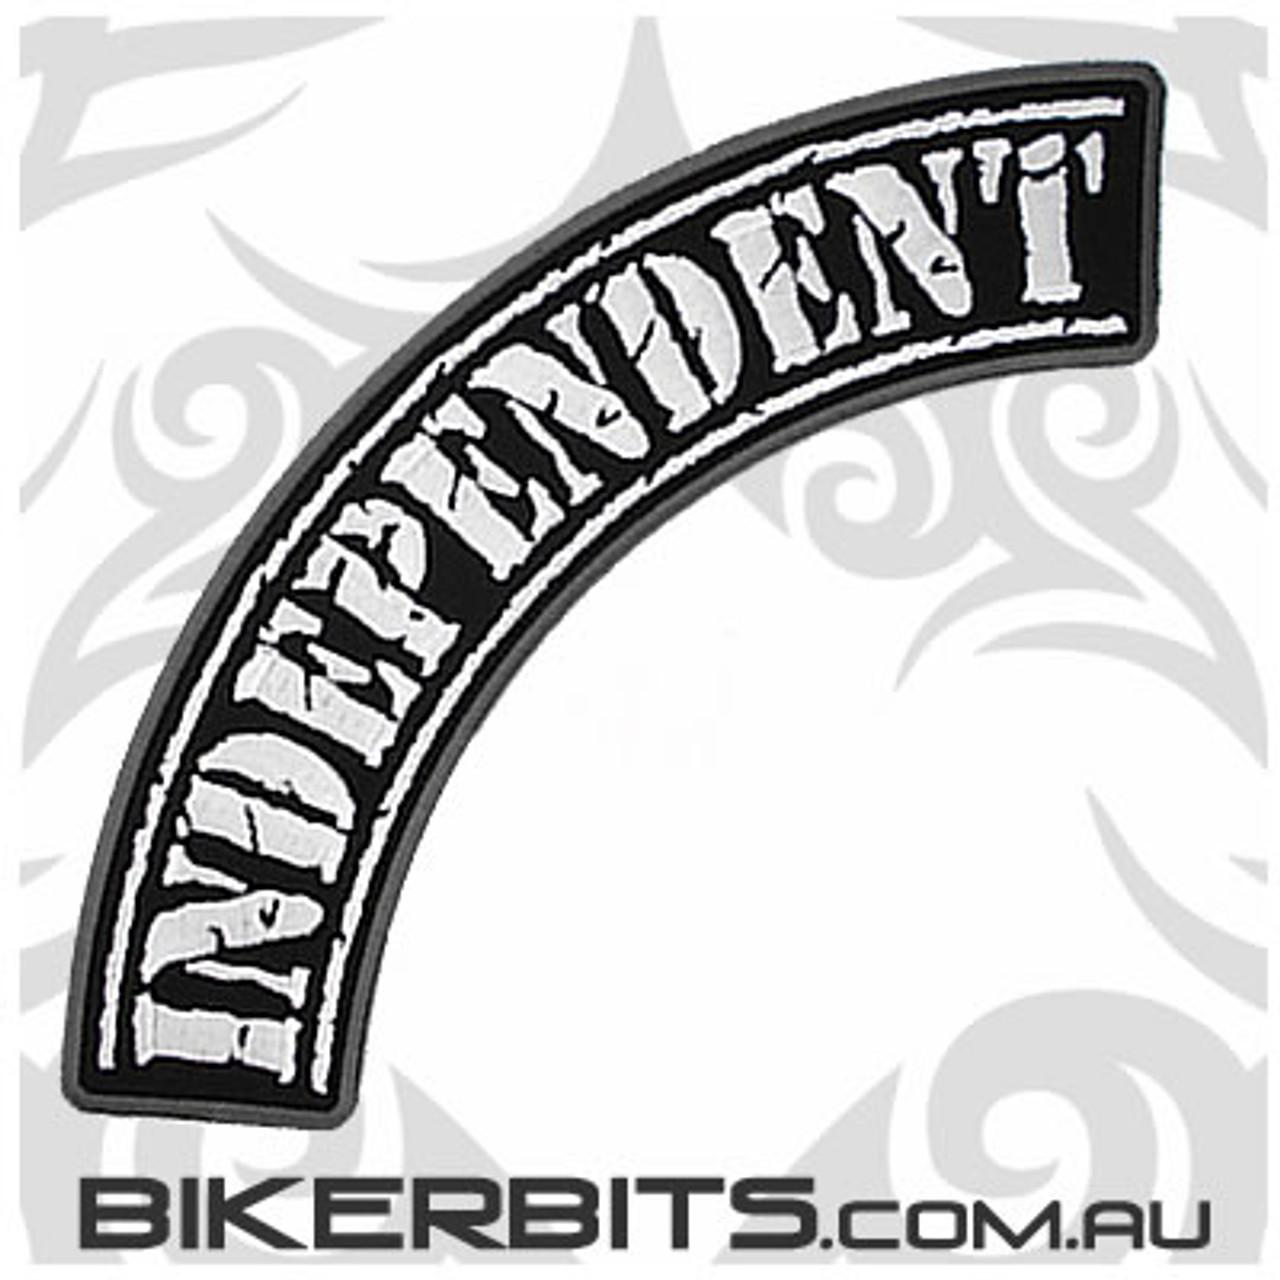 Patch - Biker Club Rocker - Independent - Distressed